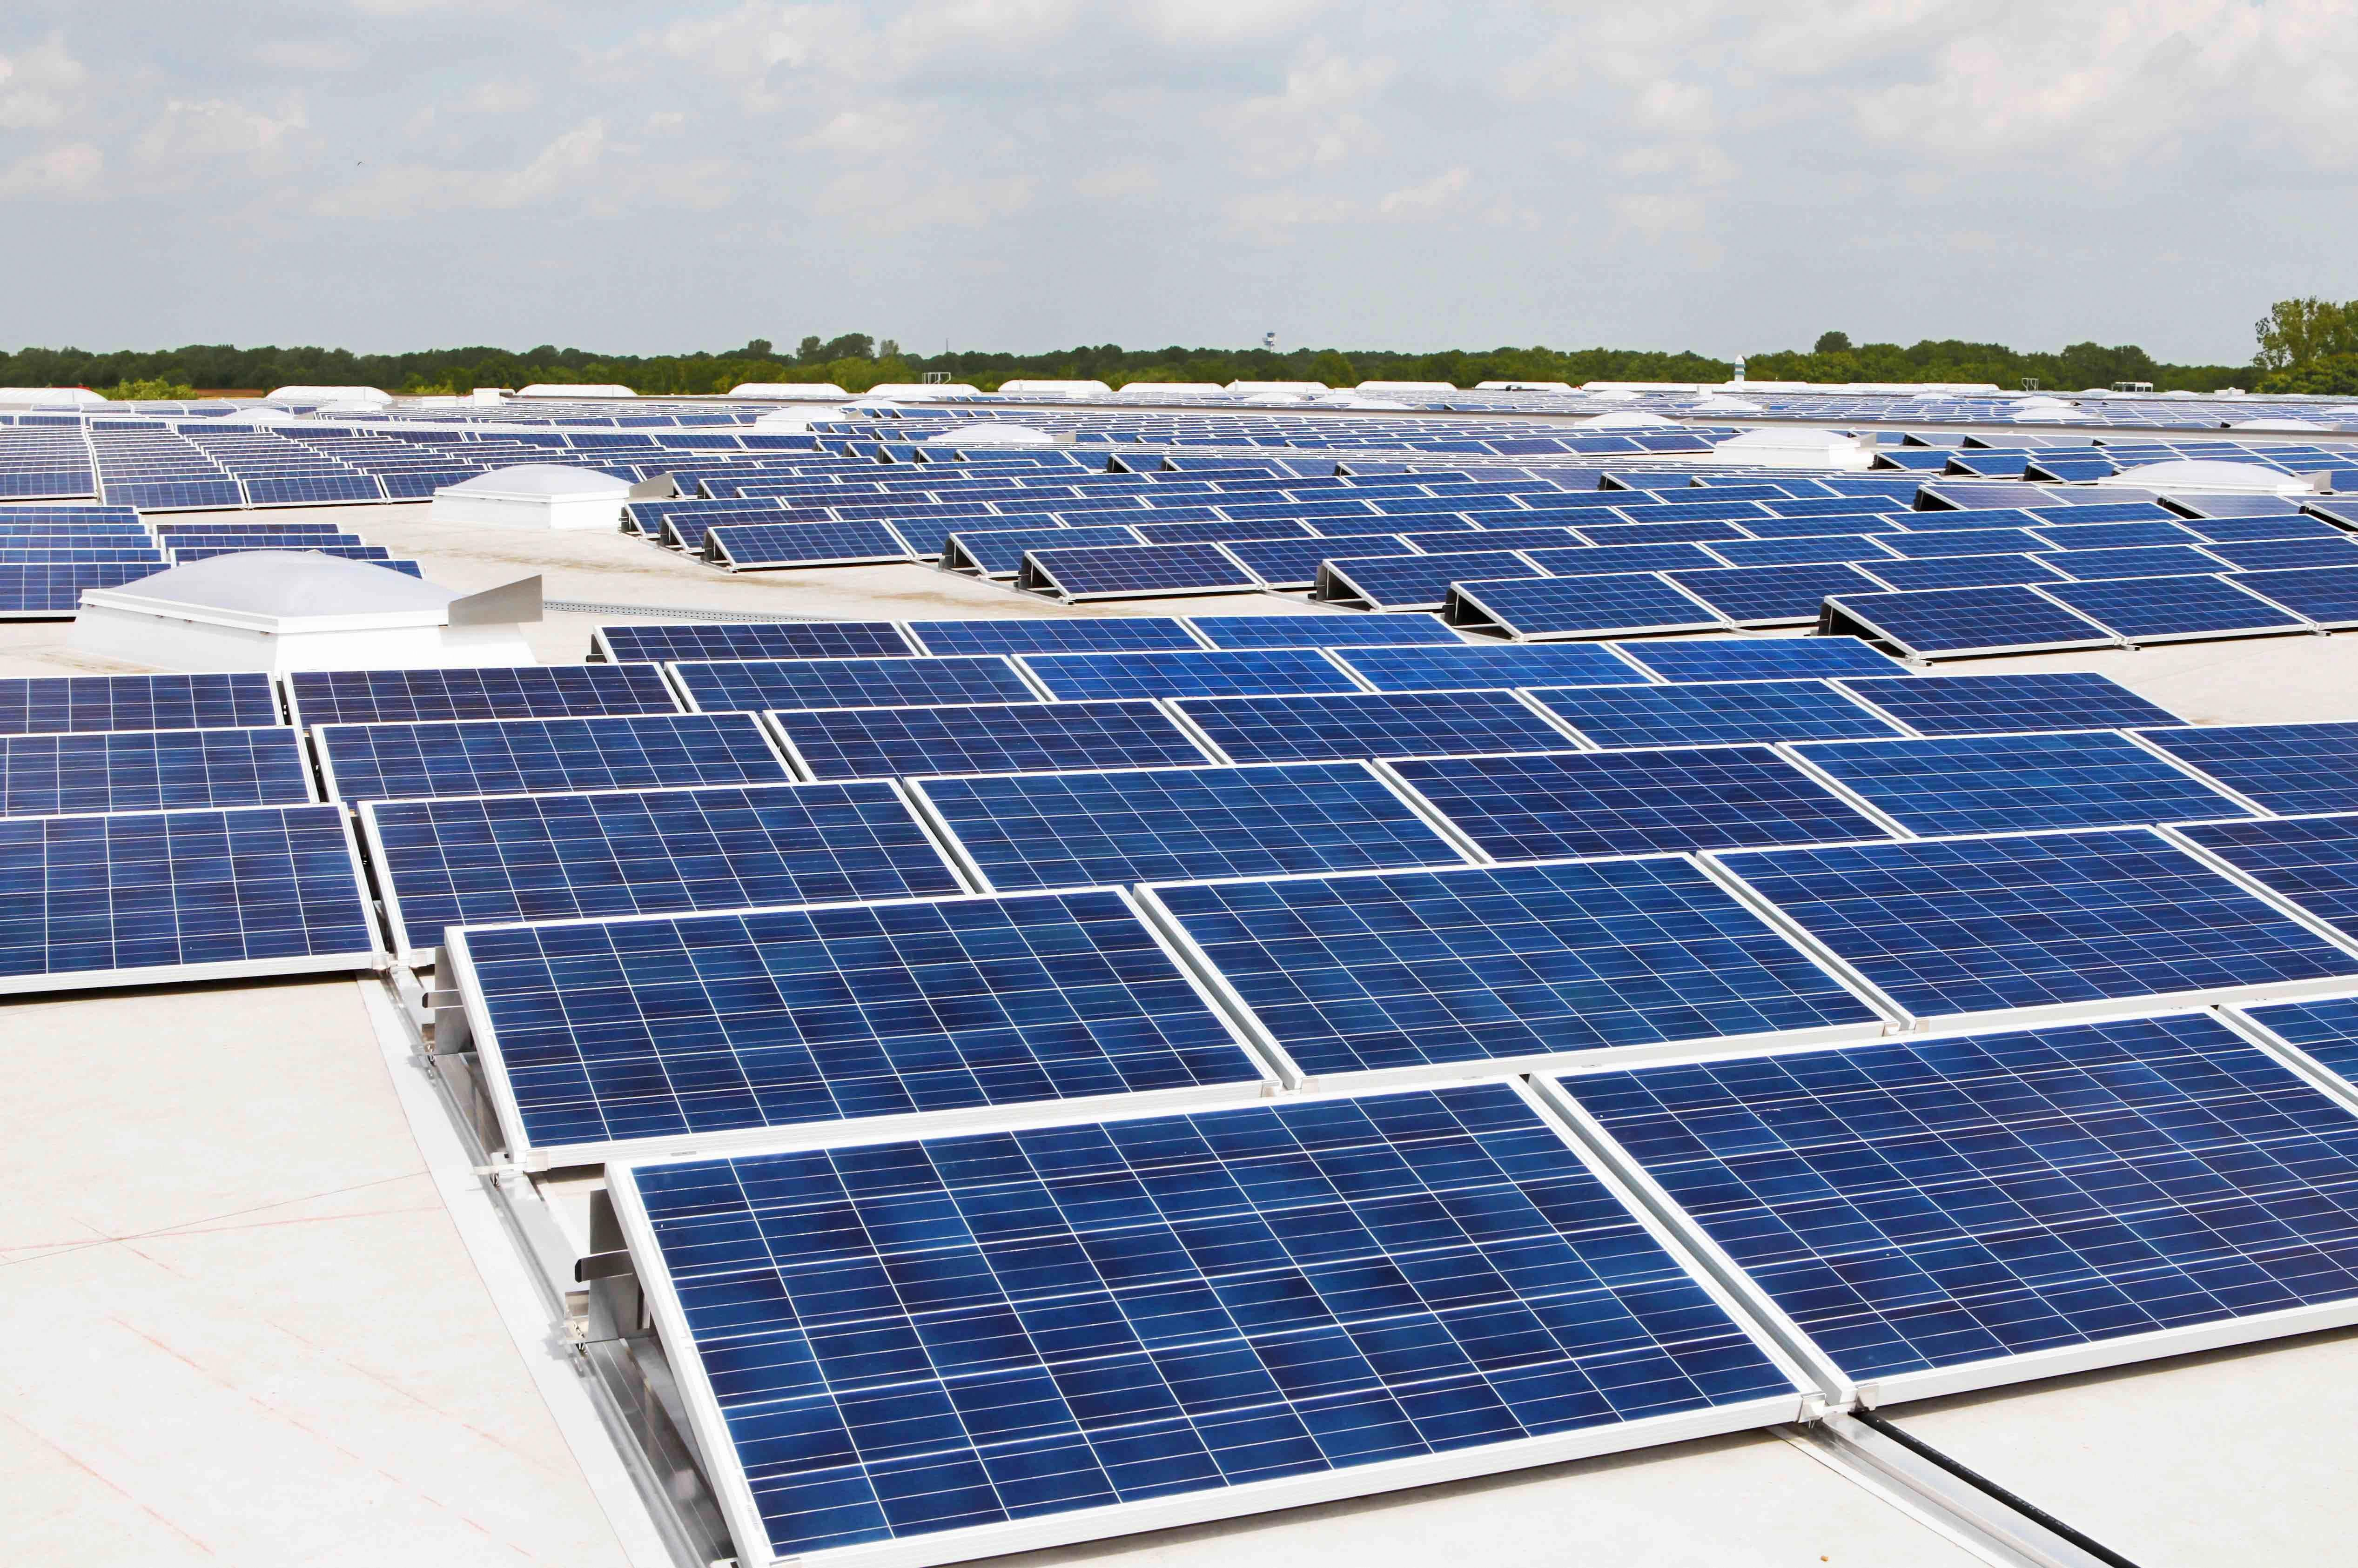 Solar Panels In Germany Photo Alespa Wikimedia Click To Enlarge Solarpanels Solarenergy Solarpower Solar In 2020 Solar Panels Best Solar Panels Residential Solar